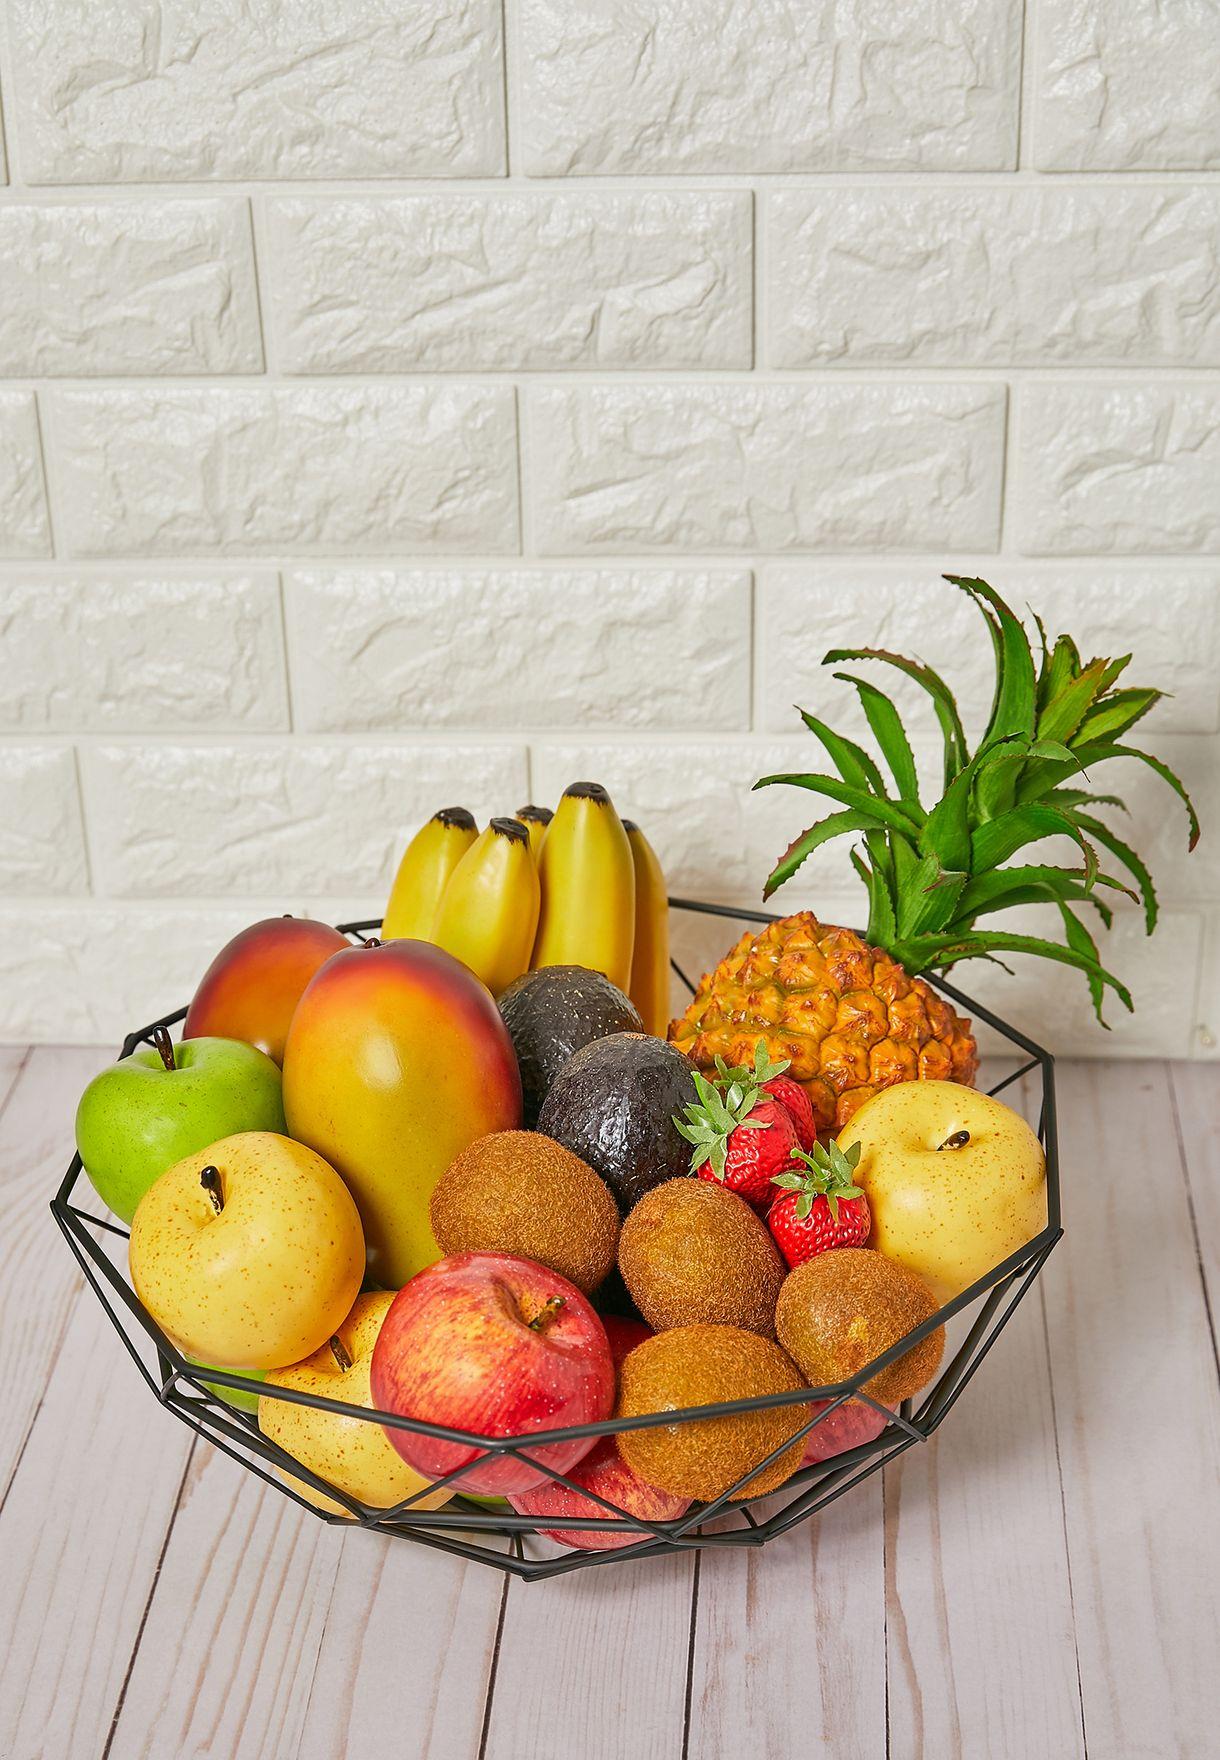 Cut Large Basket